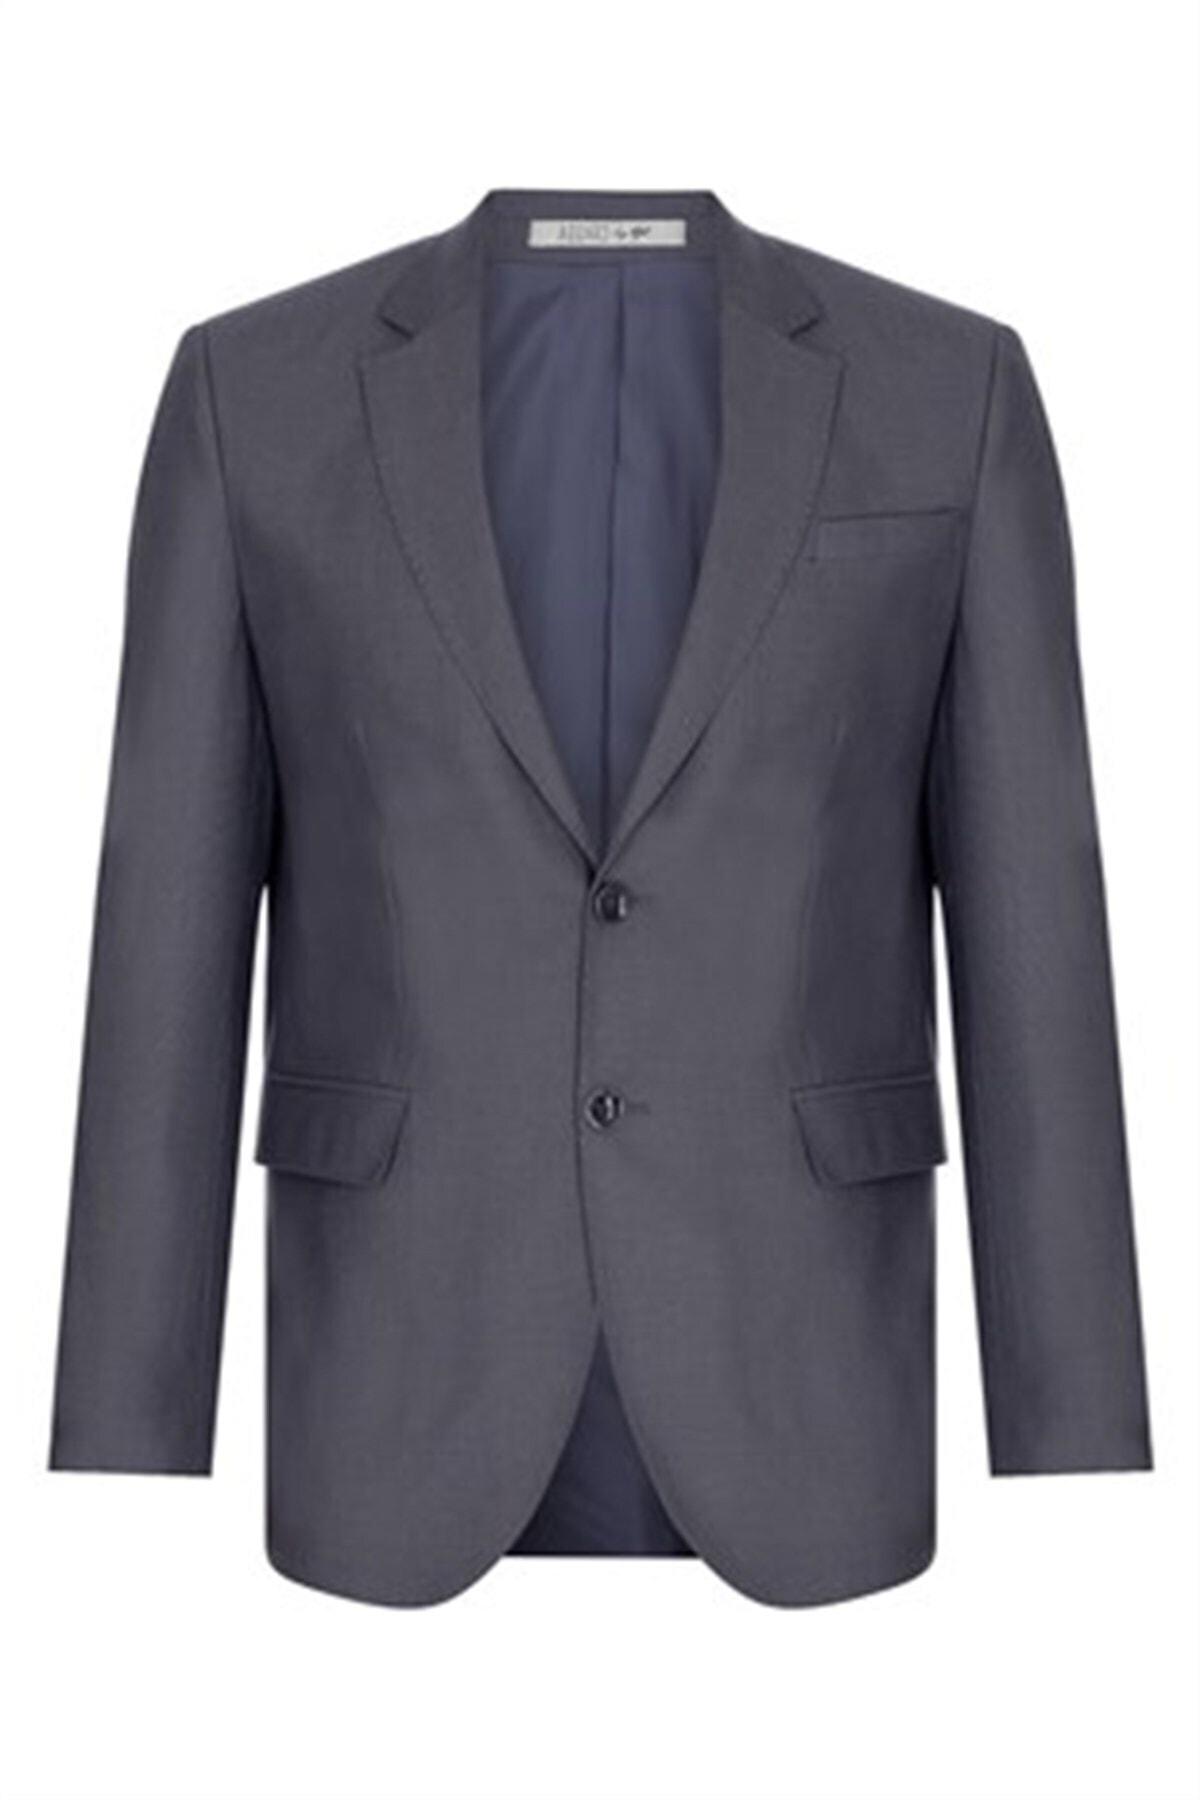 İgs Erkek Duman Regularfıt / Rahat Kalıp Std Takım Elbise 2